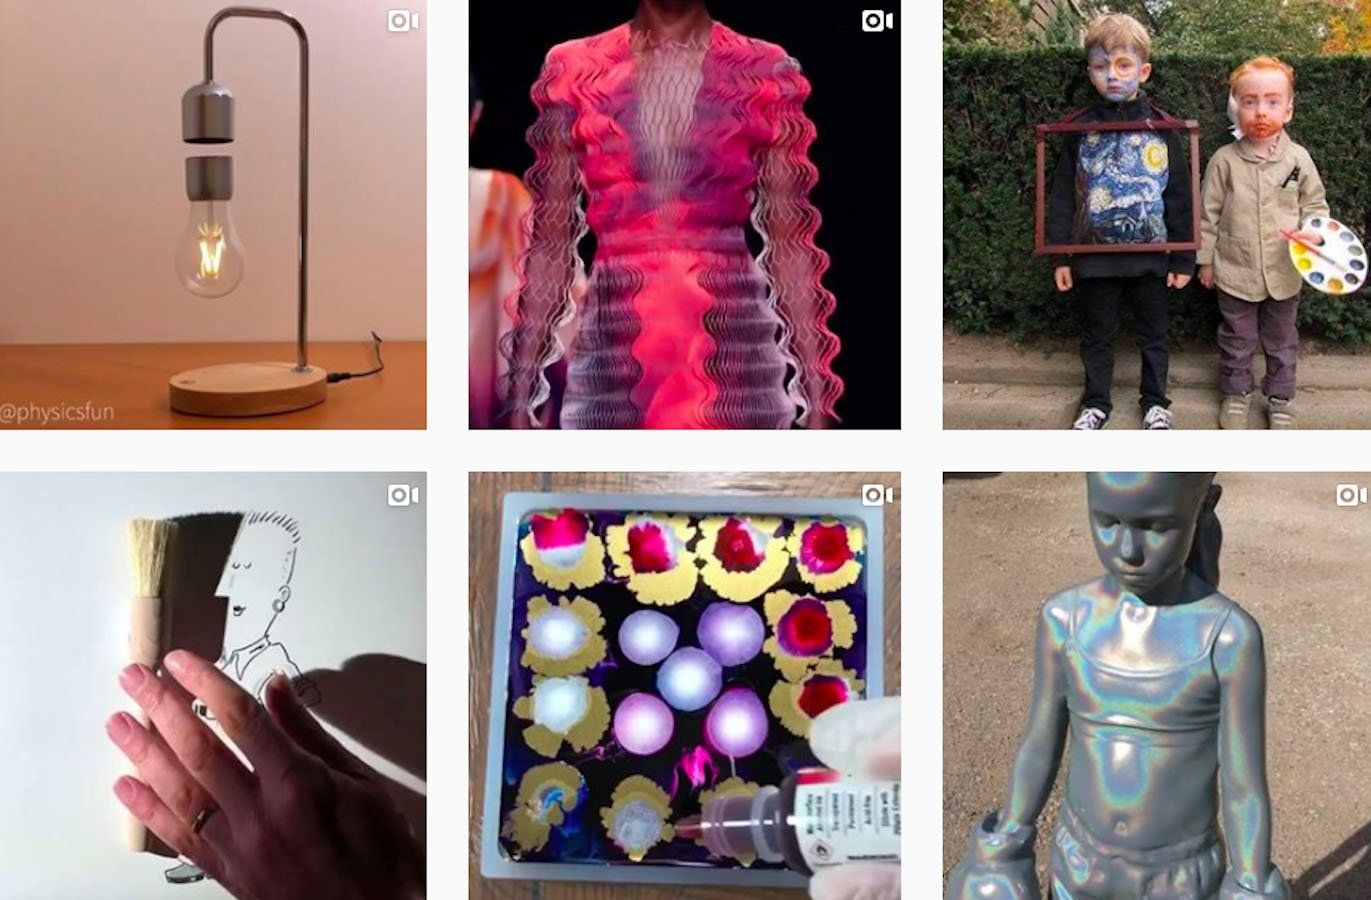 Web Design Inspiration: 110+ Accounts On Instagram and 10+ Best UX & Web Design Books in 2020 - artfido